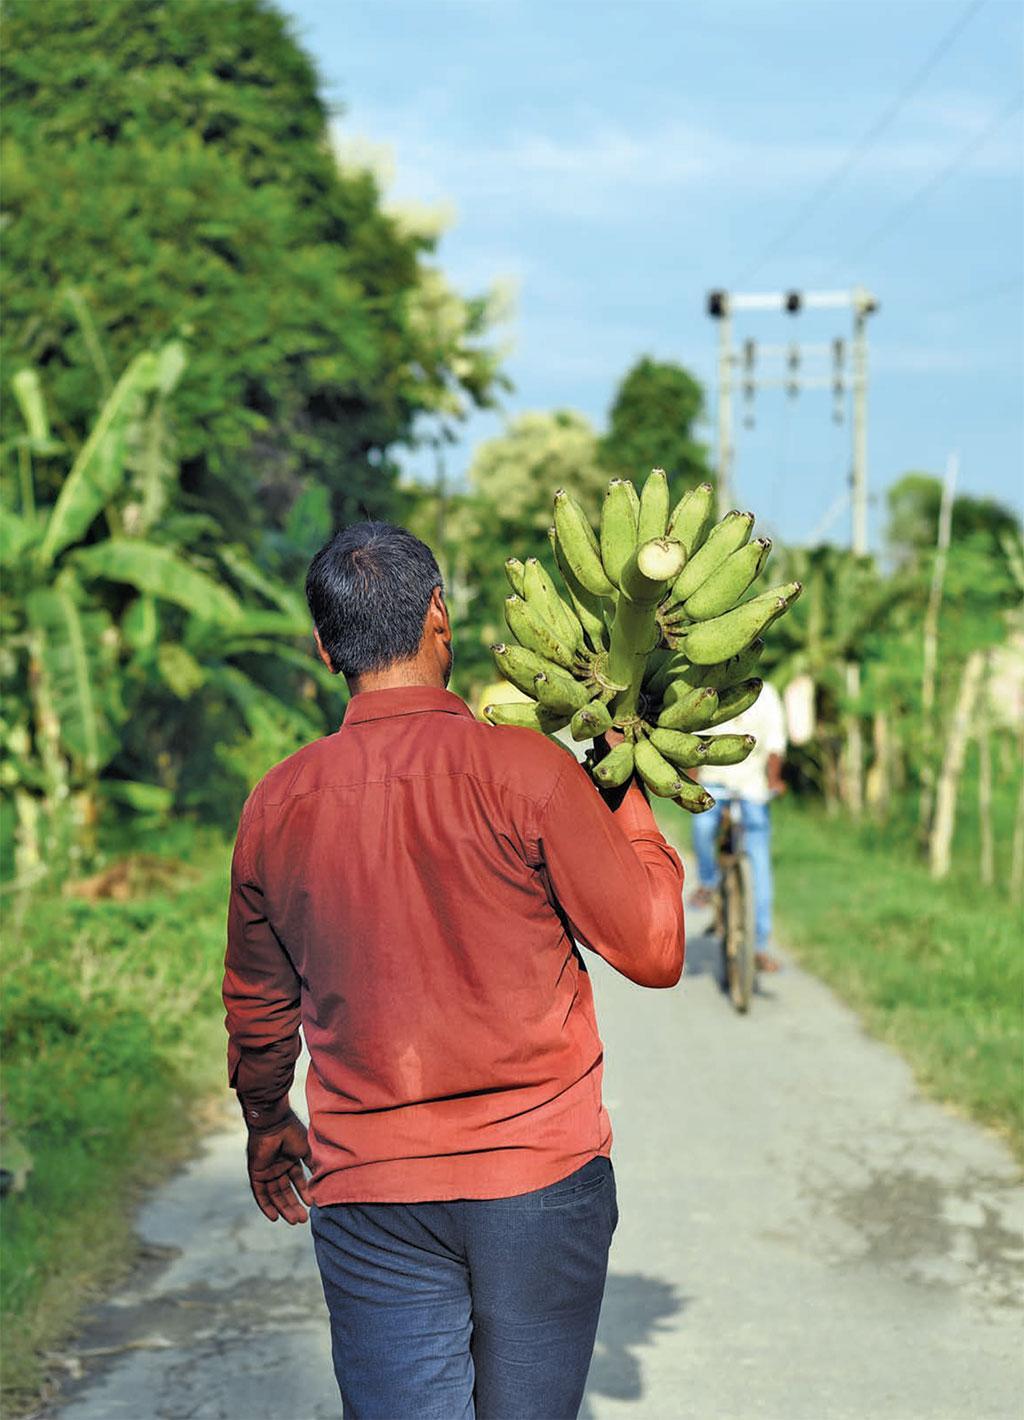 Traditional banana varieties